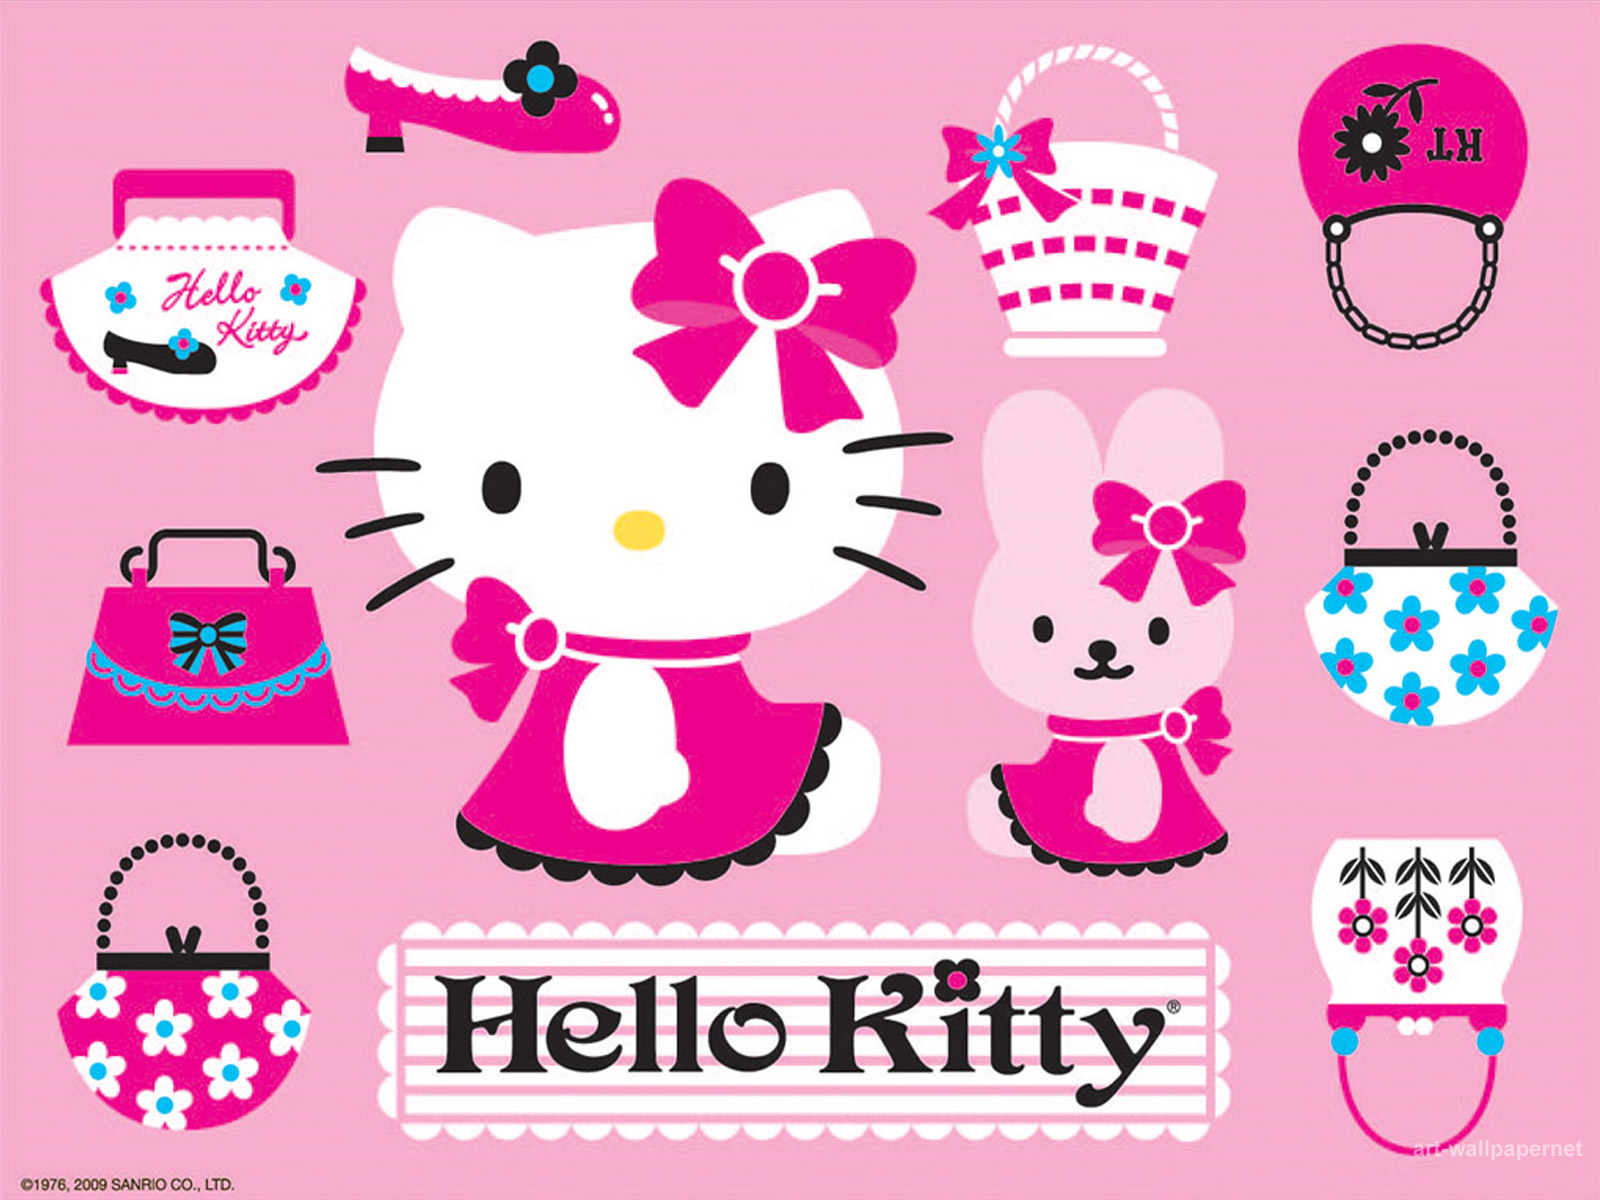 78 ] Hello Kitty Wallpaper For Puter On WallpaperSafari